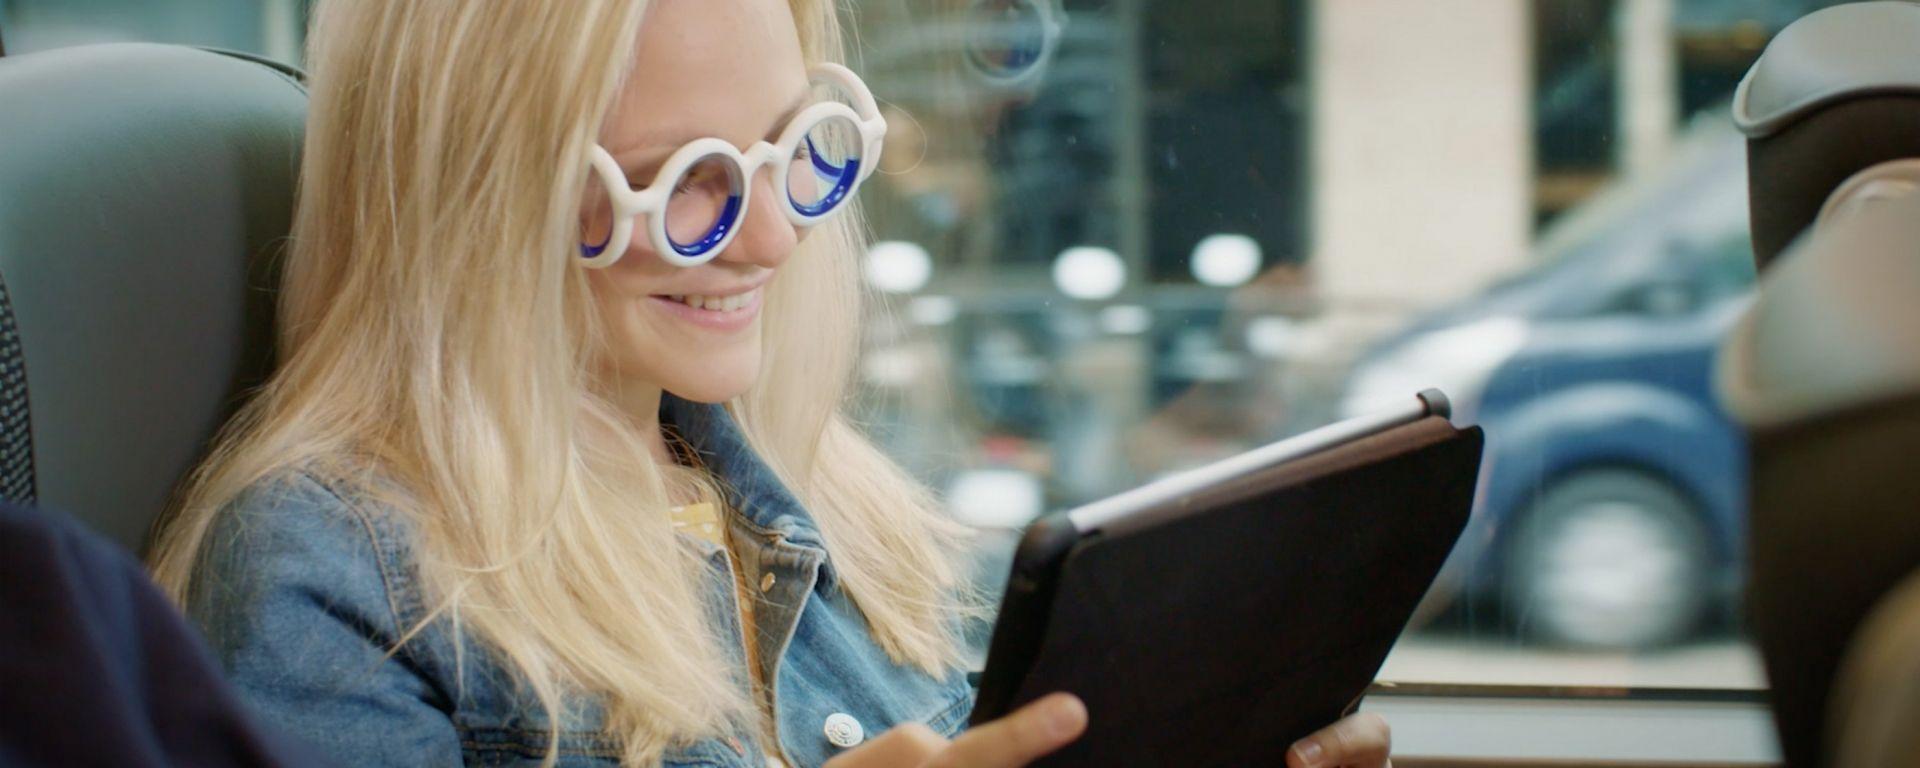 Seetroen: gli occhiali anti mal d'auto by Citroen